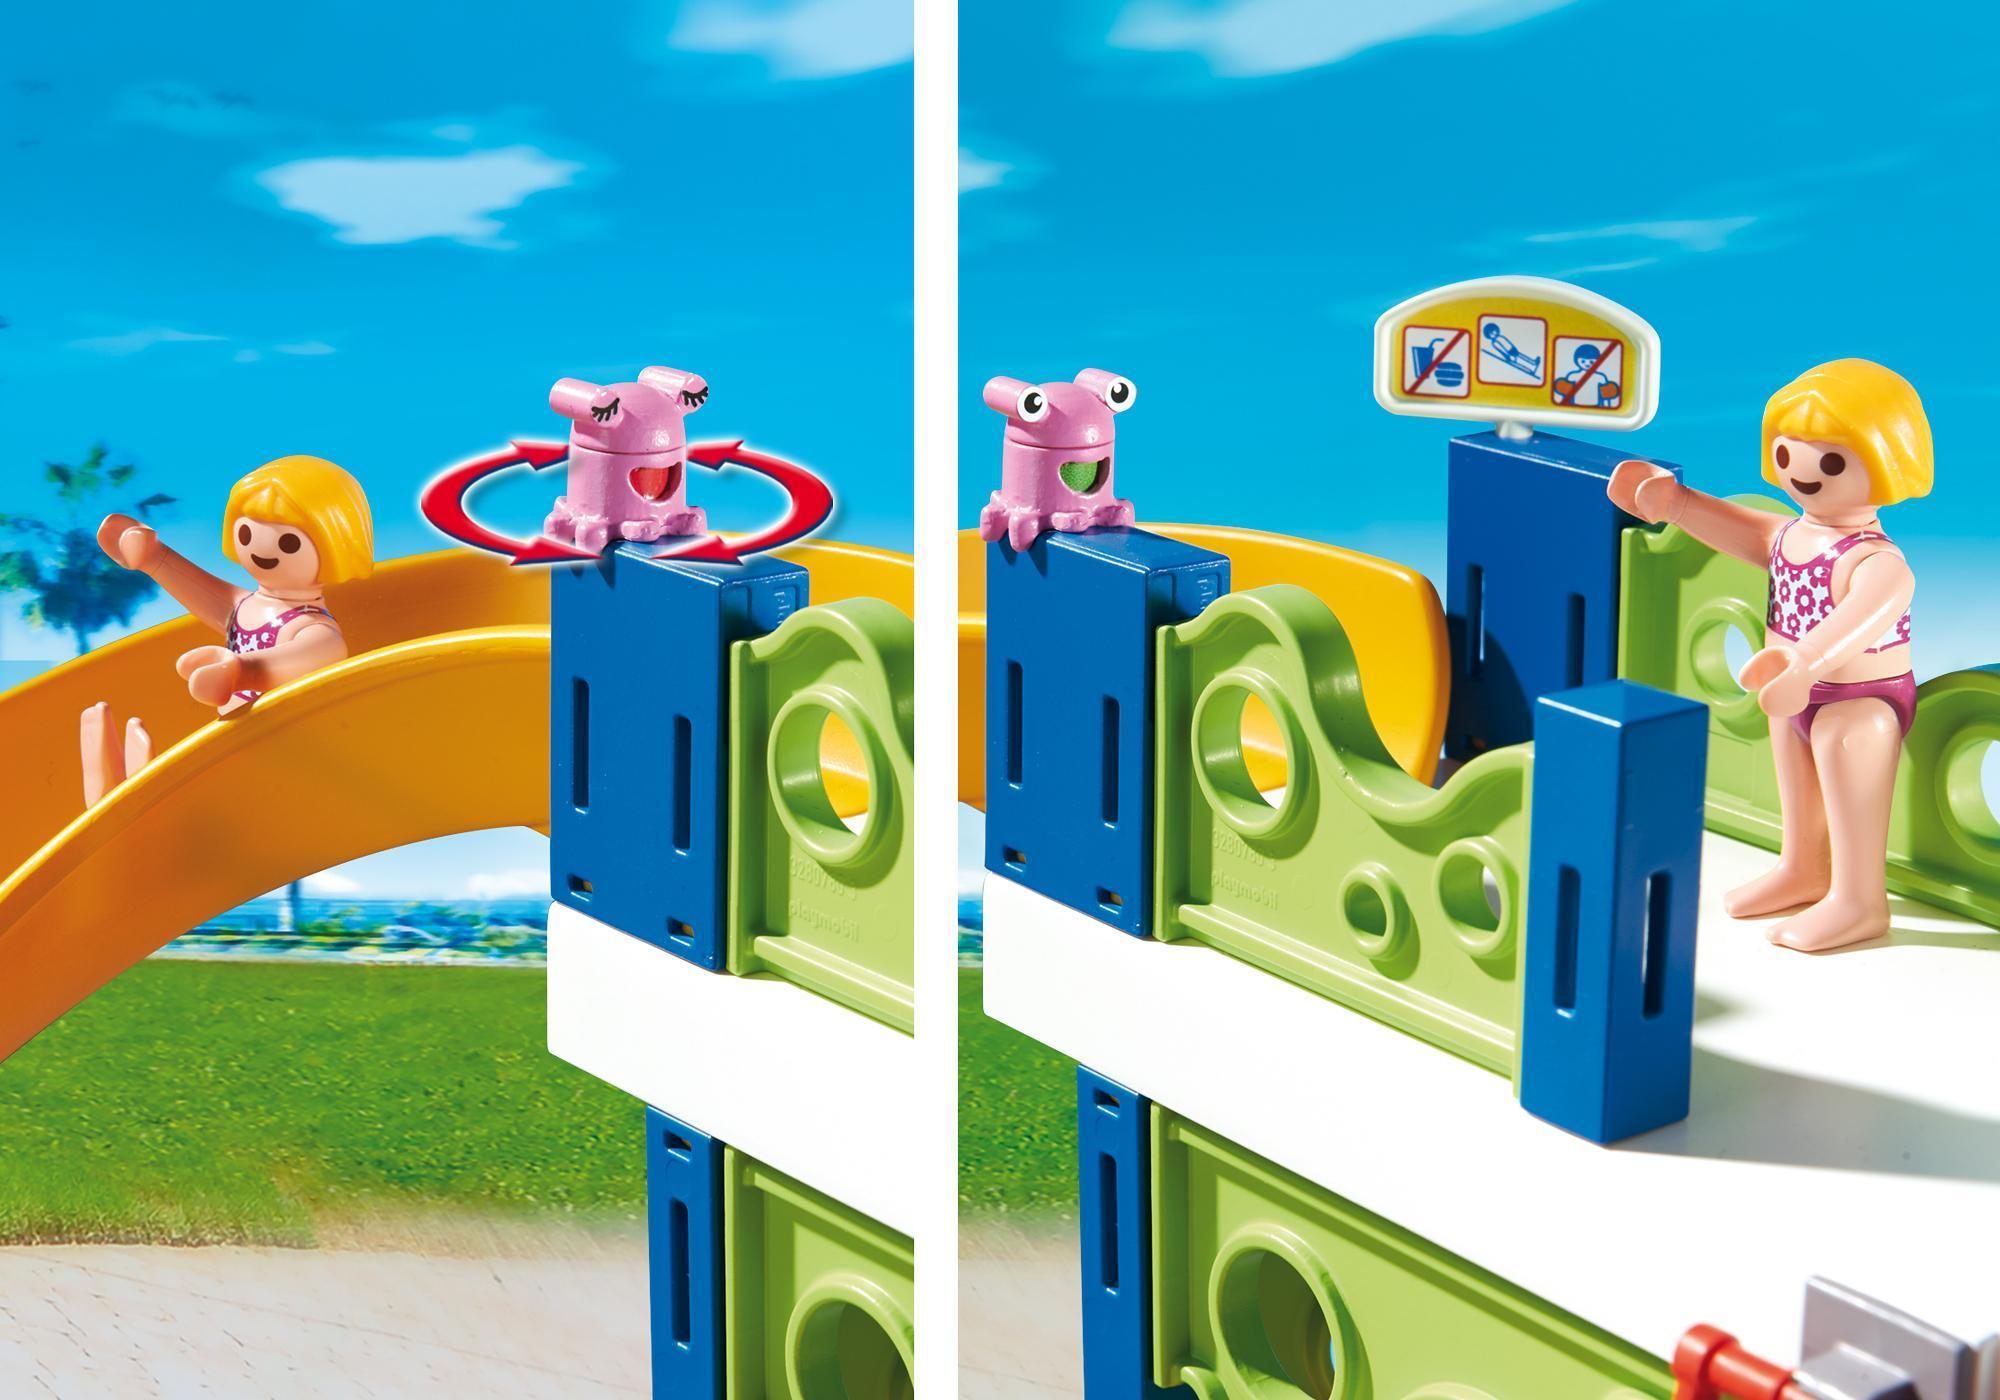 http://media.playmobil.com/i/playmobil/6669_product_extra3/Torre degli scivoli con piscina